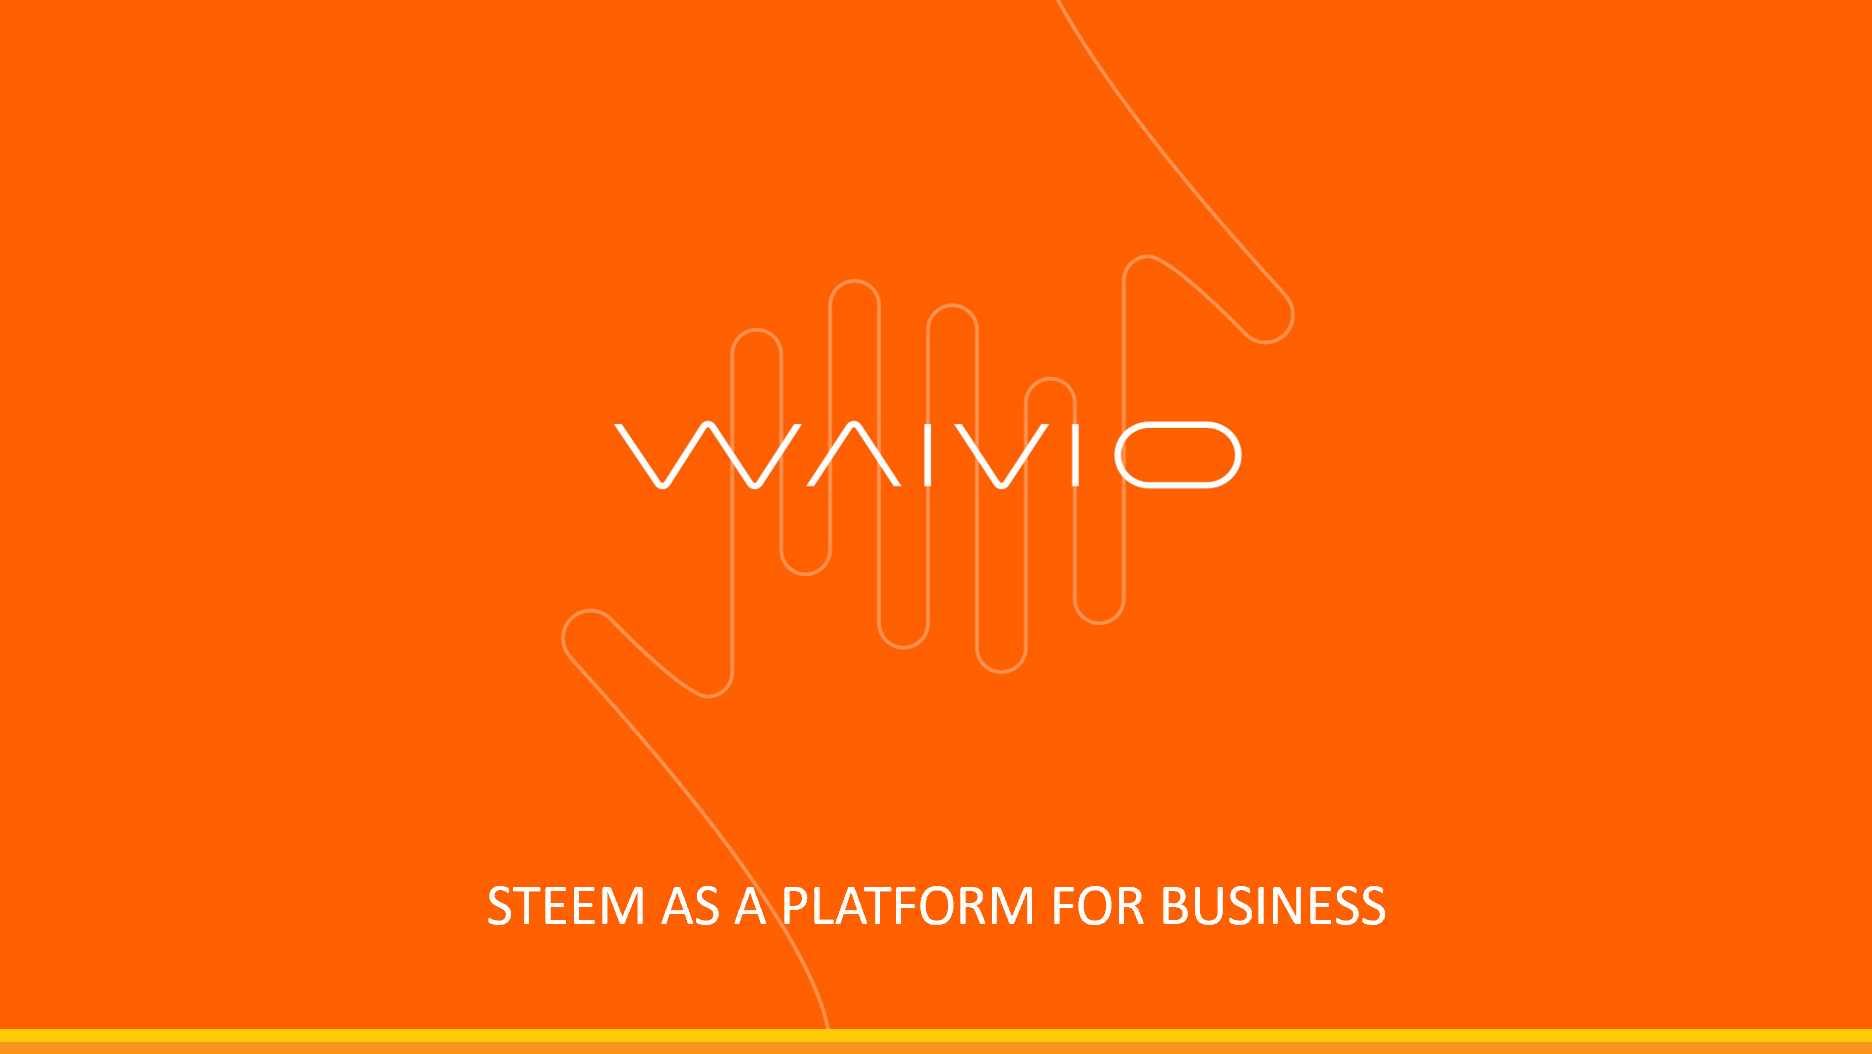 Steem as a platform for business